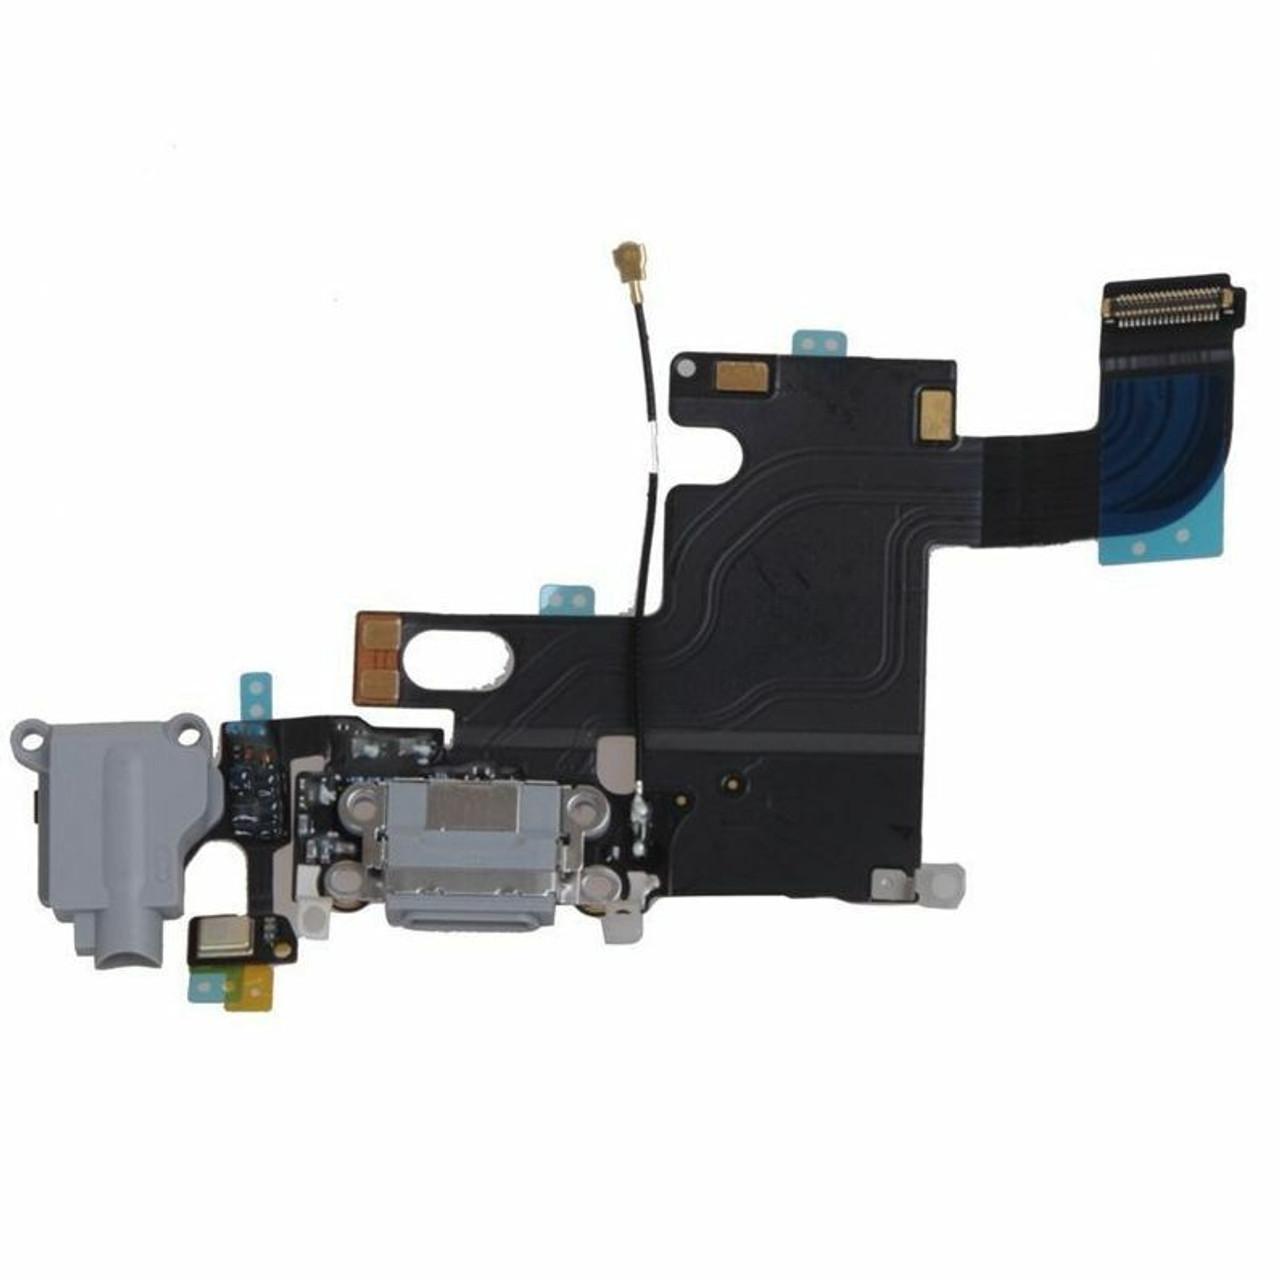 OEM SPEC Gray Charging Port Headphone Jack Audio Flex Cable For iPhone 6 4.7''